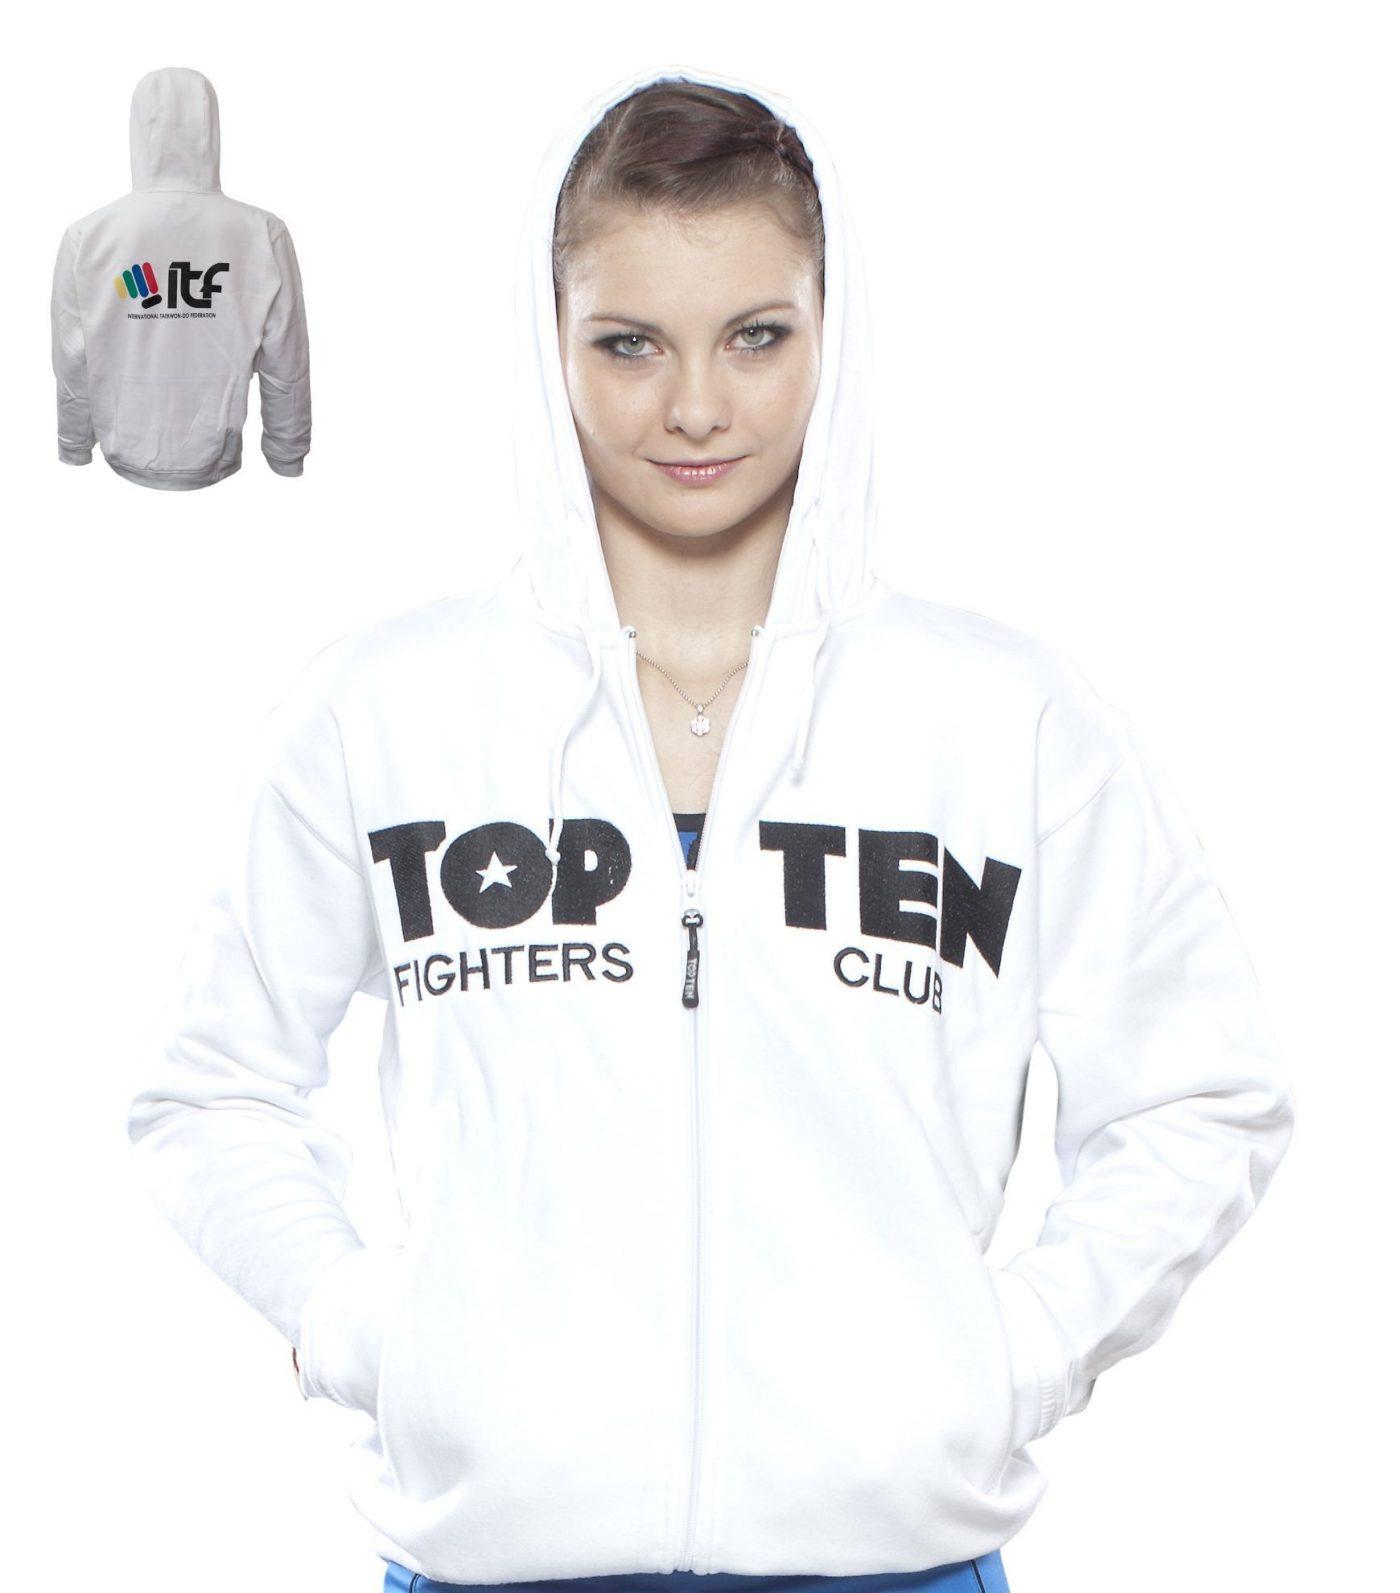 "TOP TEN Trui met hoodie en rits ""TOP TEN Fighters Club"" Wit"